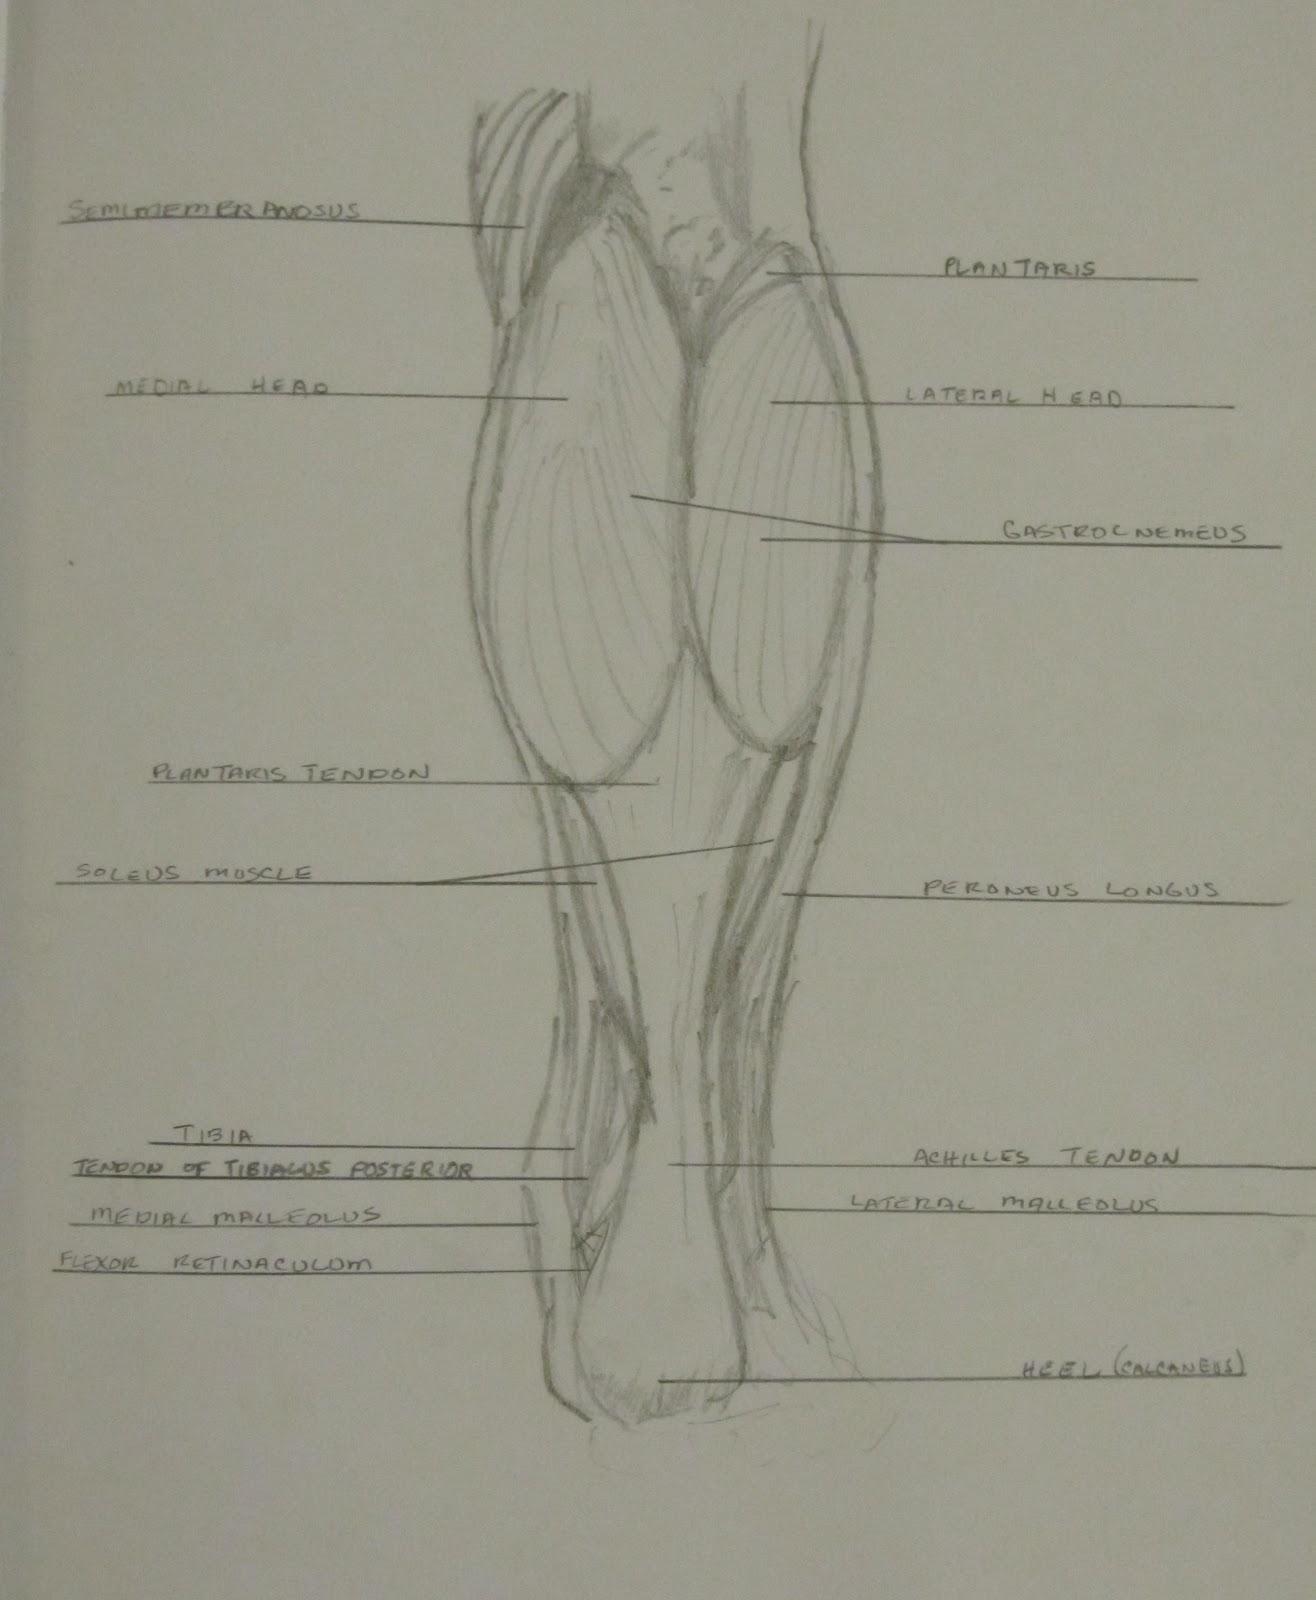 leg muscles drawing - photo #19